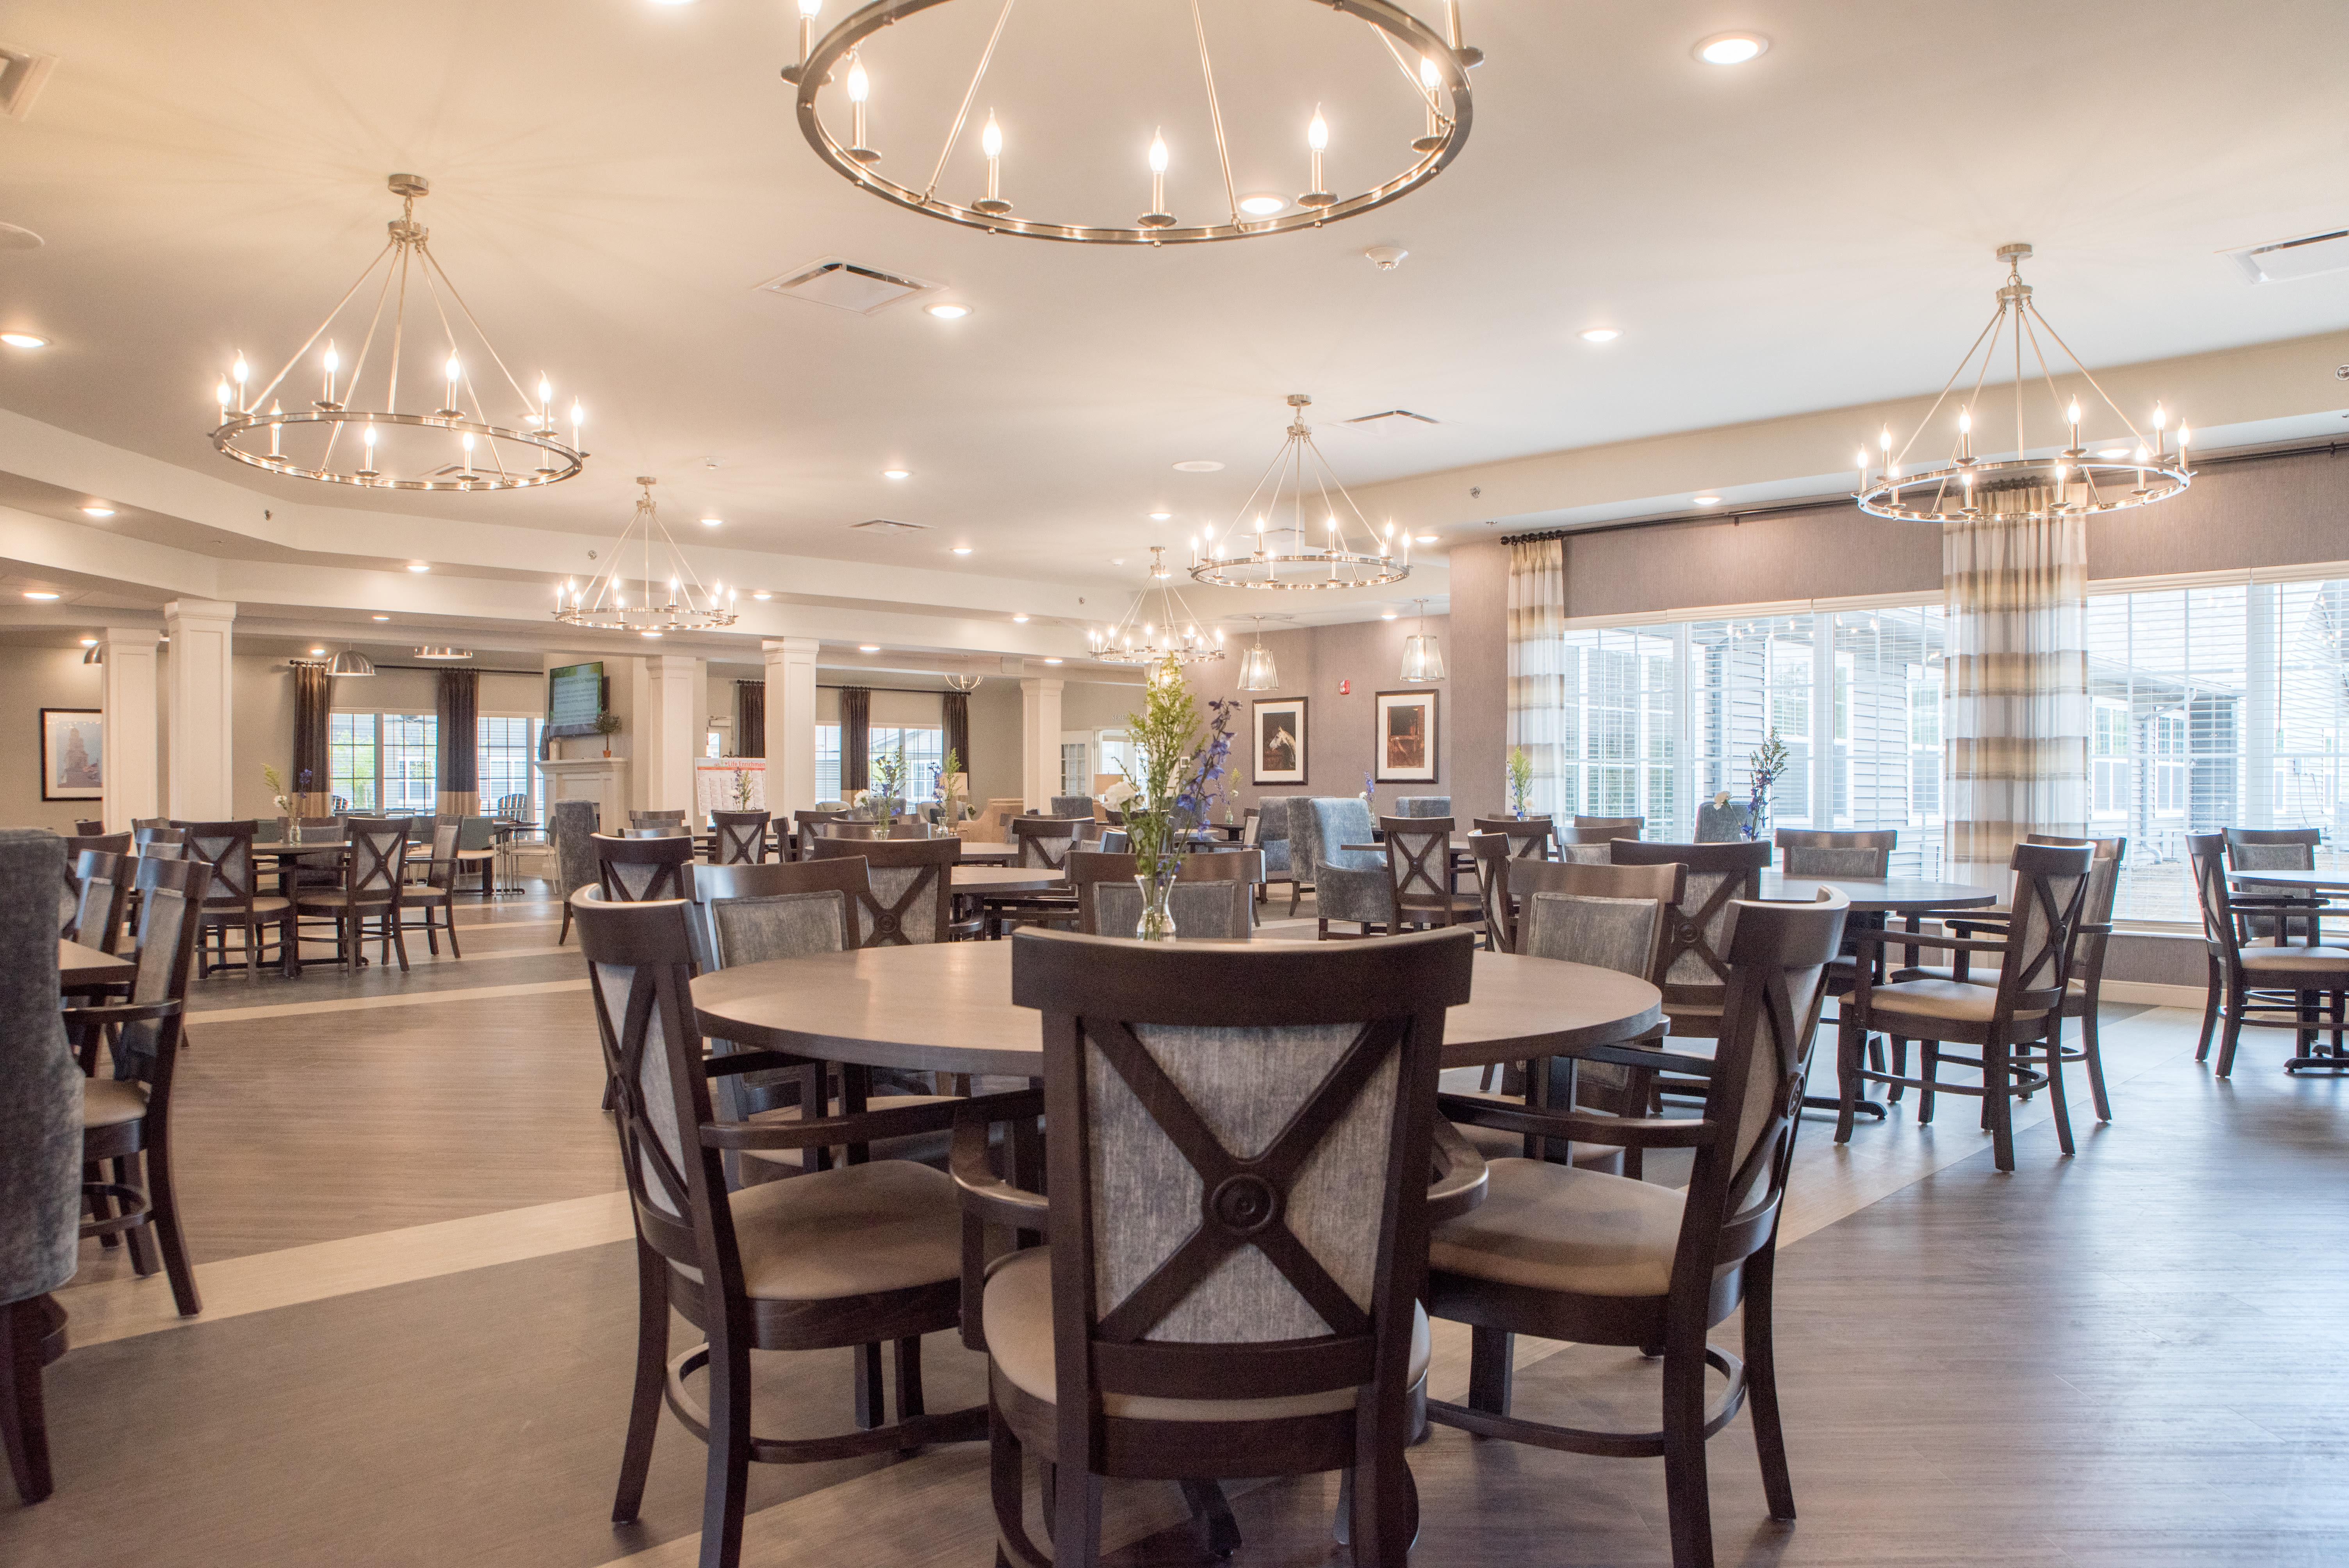 Resident dining room at Boonesboro Trail Senior Living in Winchester, Kentucky.